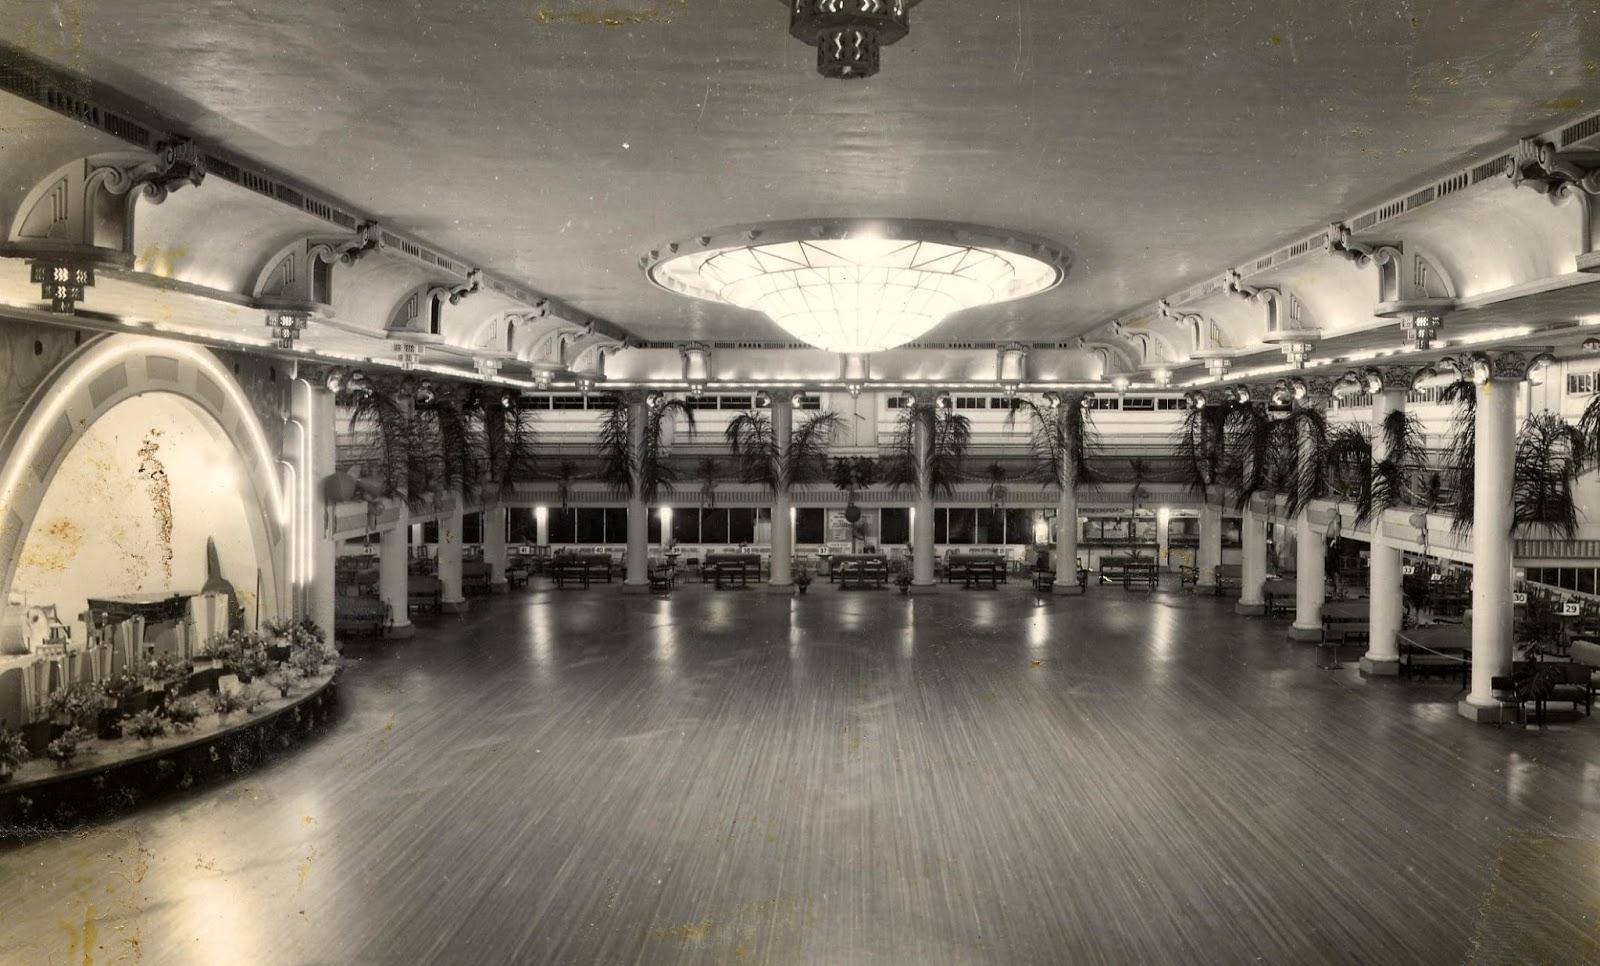 Cloudland Ballroom Brisbane Australia Gone But Not Forgotten